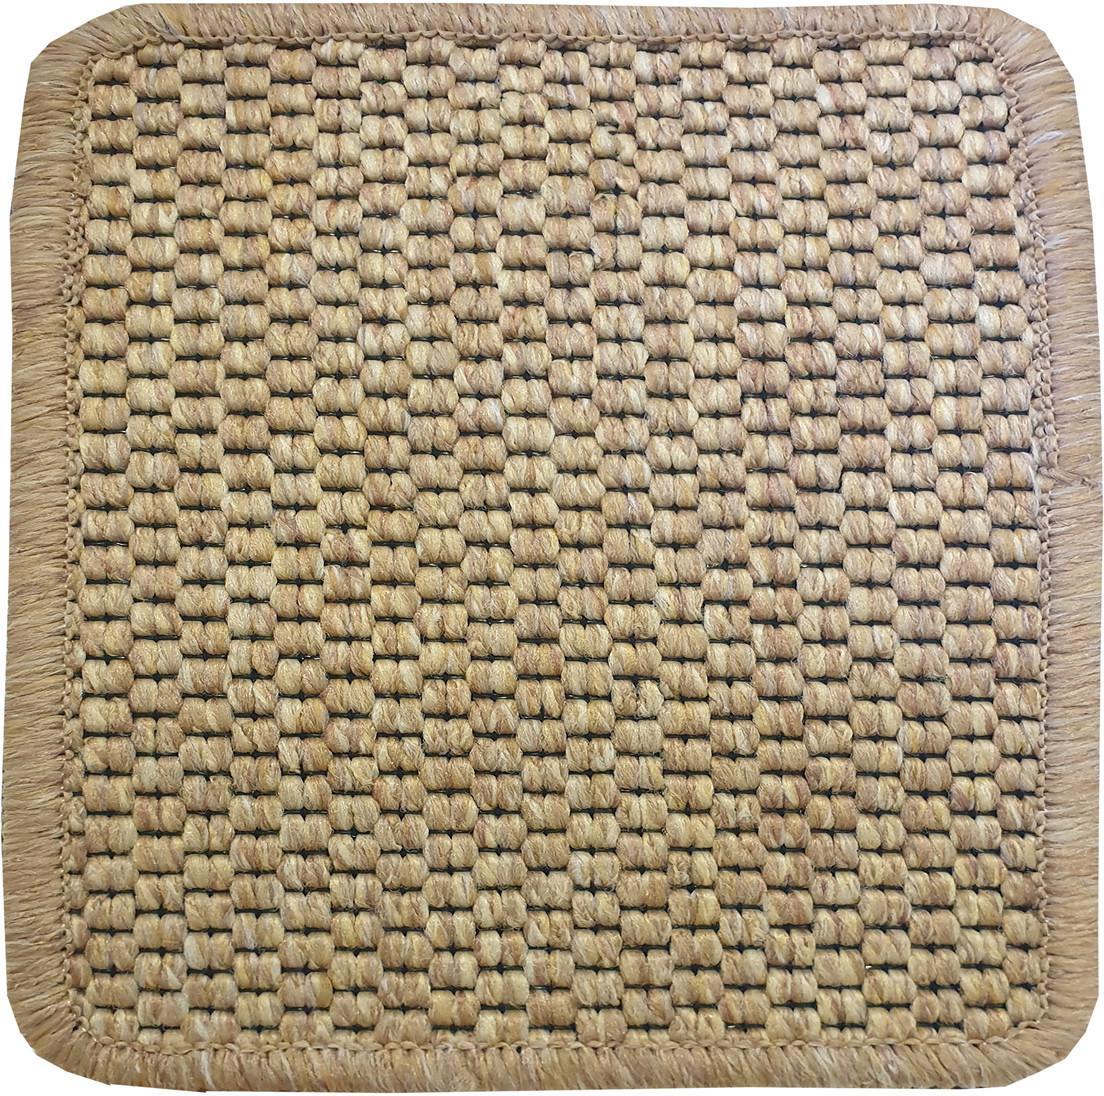 Vopi koberce Kusový koberec Nature terra čtverec - 300x300 cm